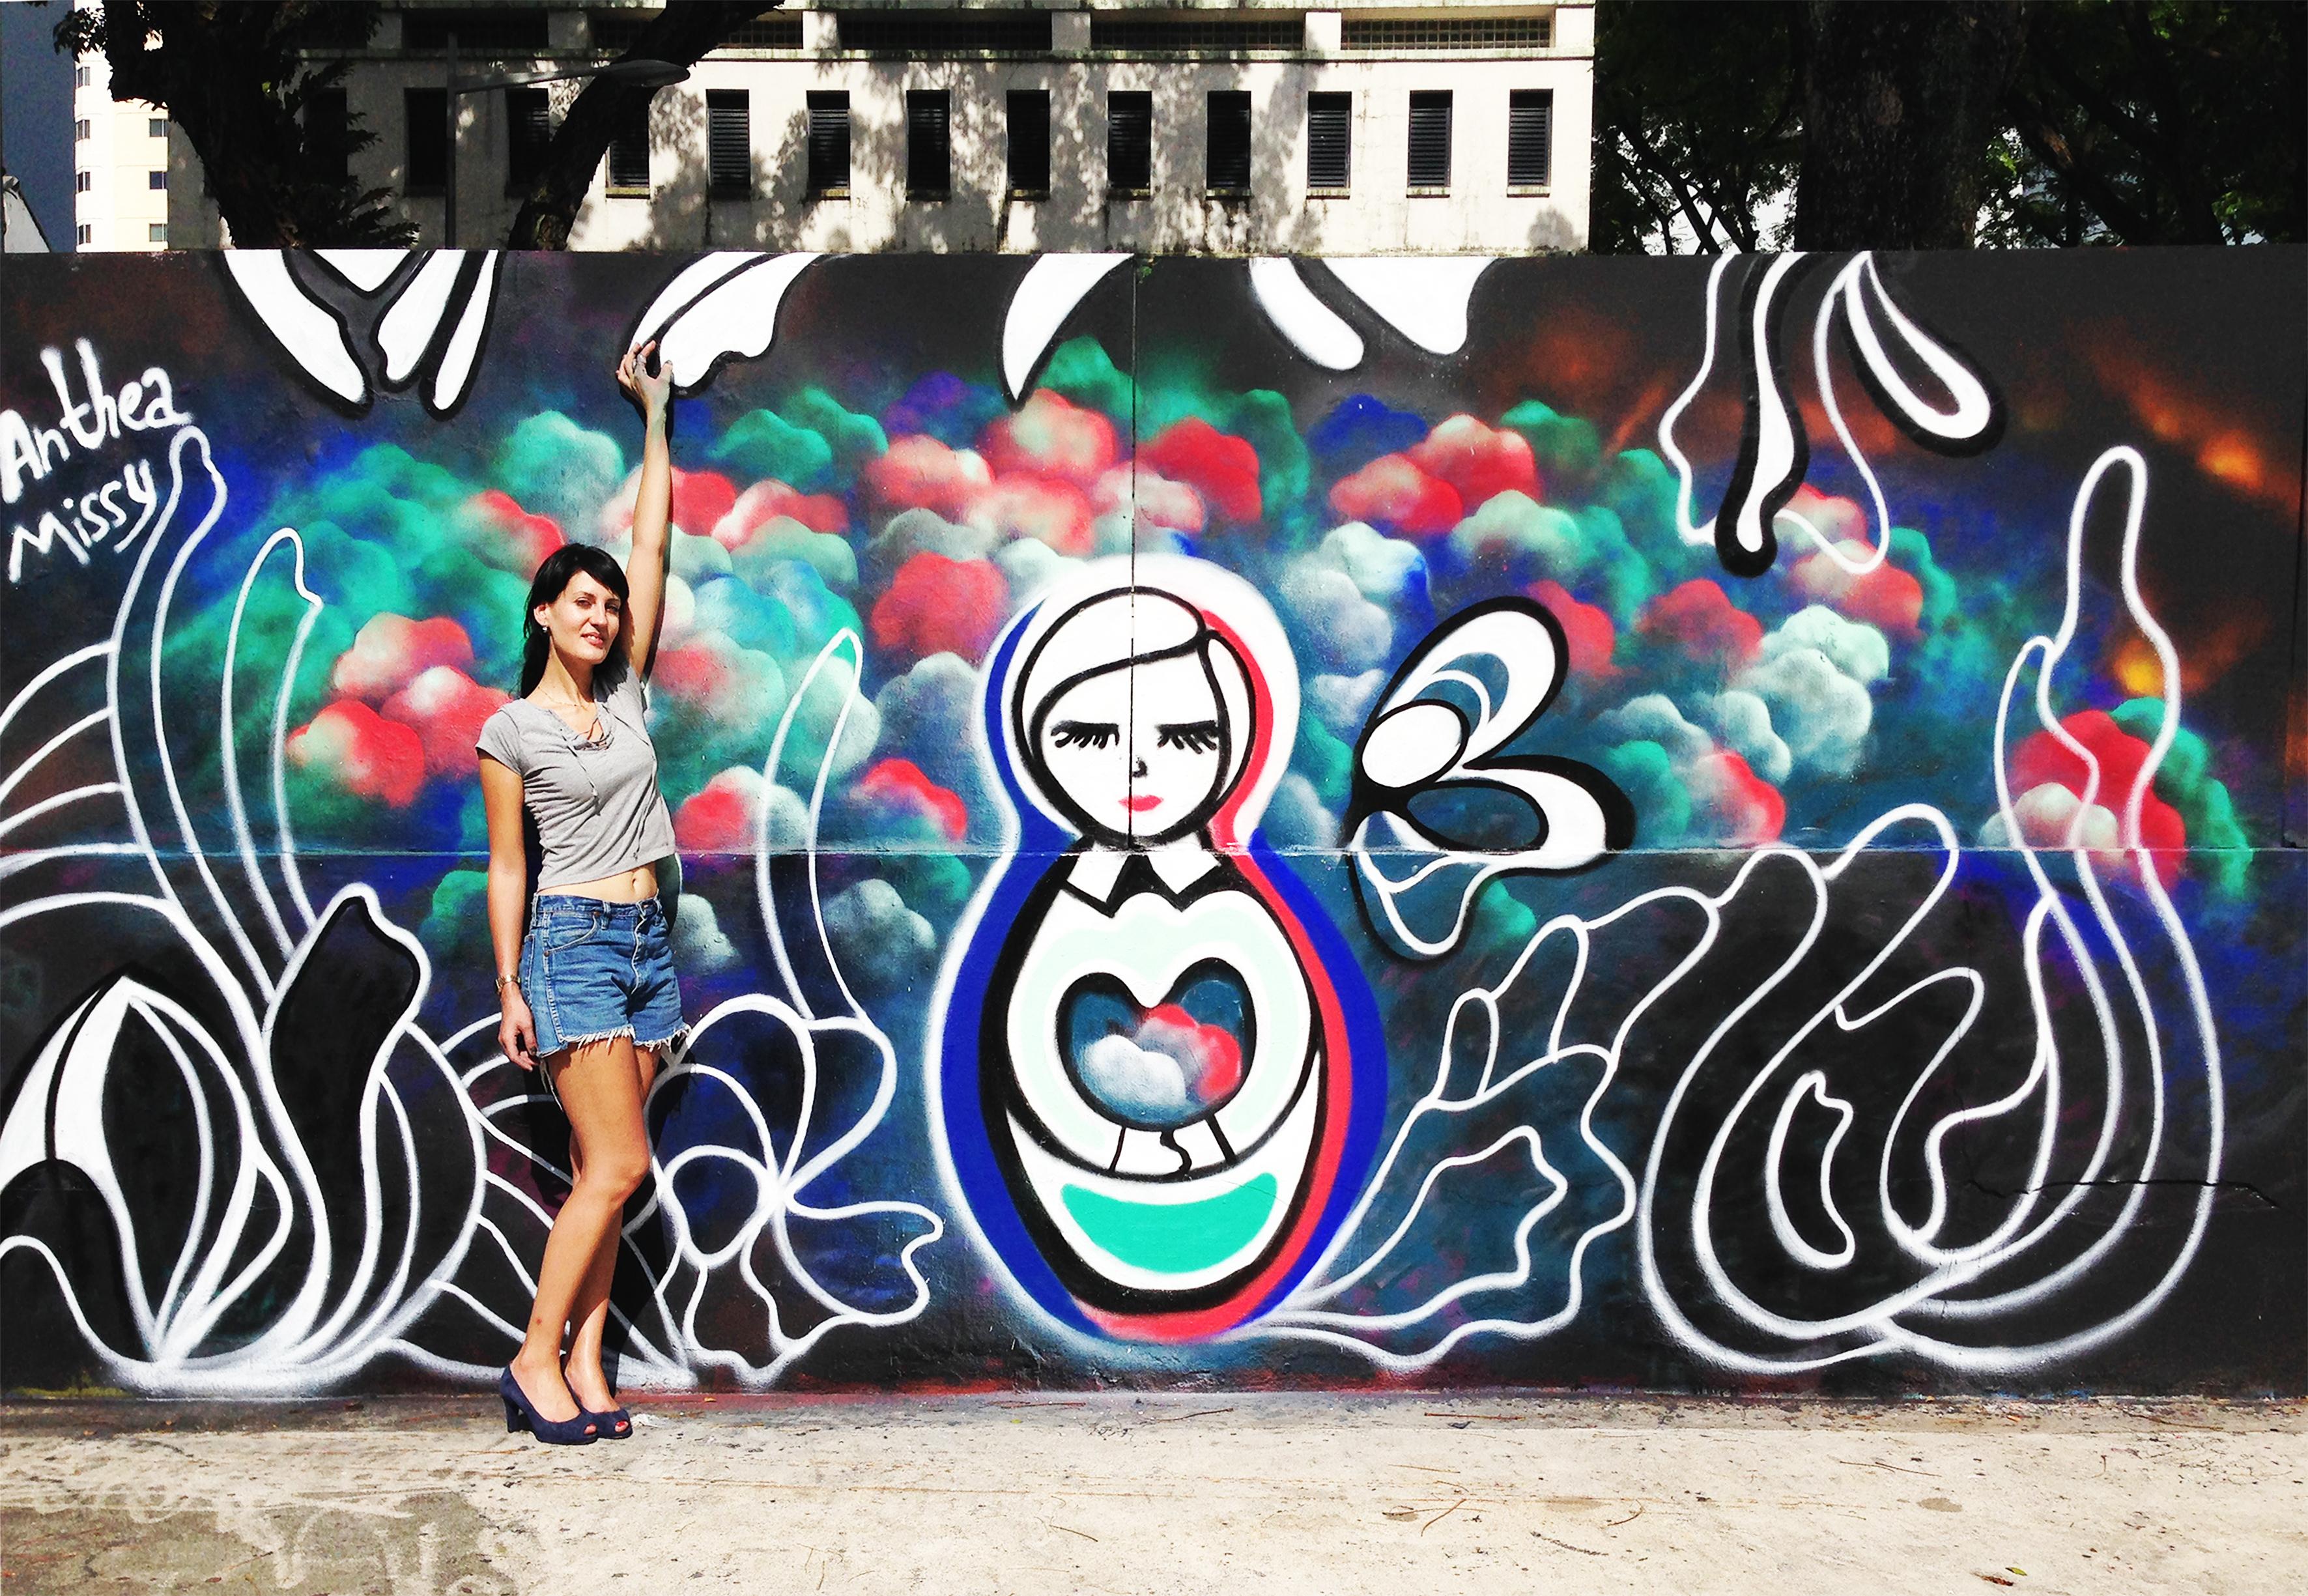 Singapore motion bloom anthea missy urban art street graffiti cute female contemporary 3